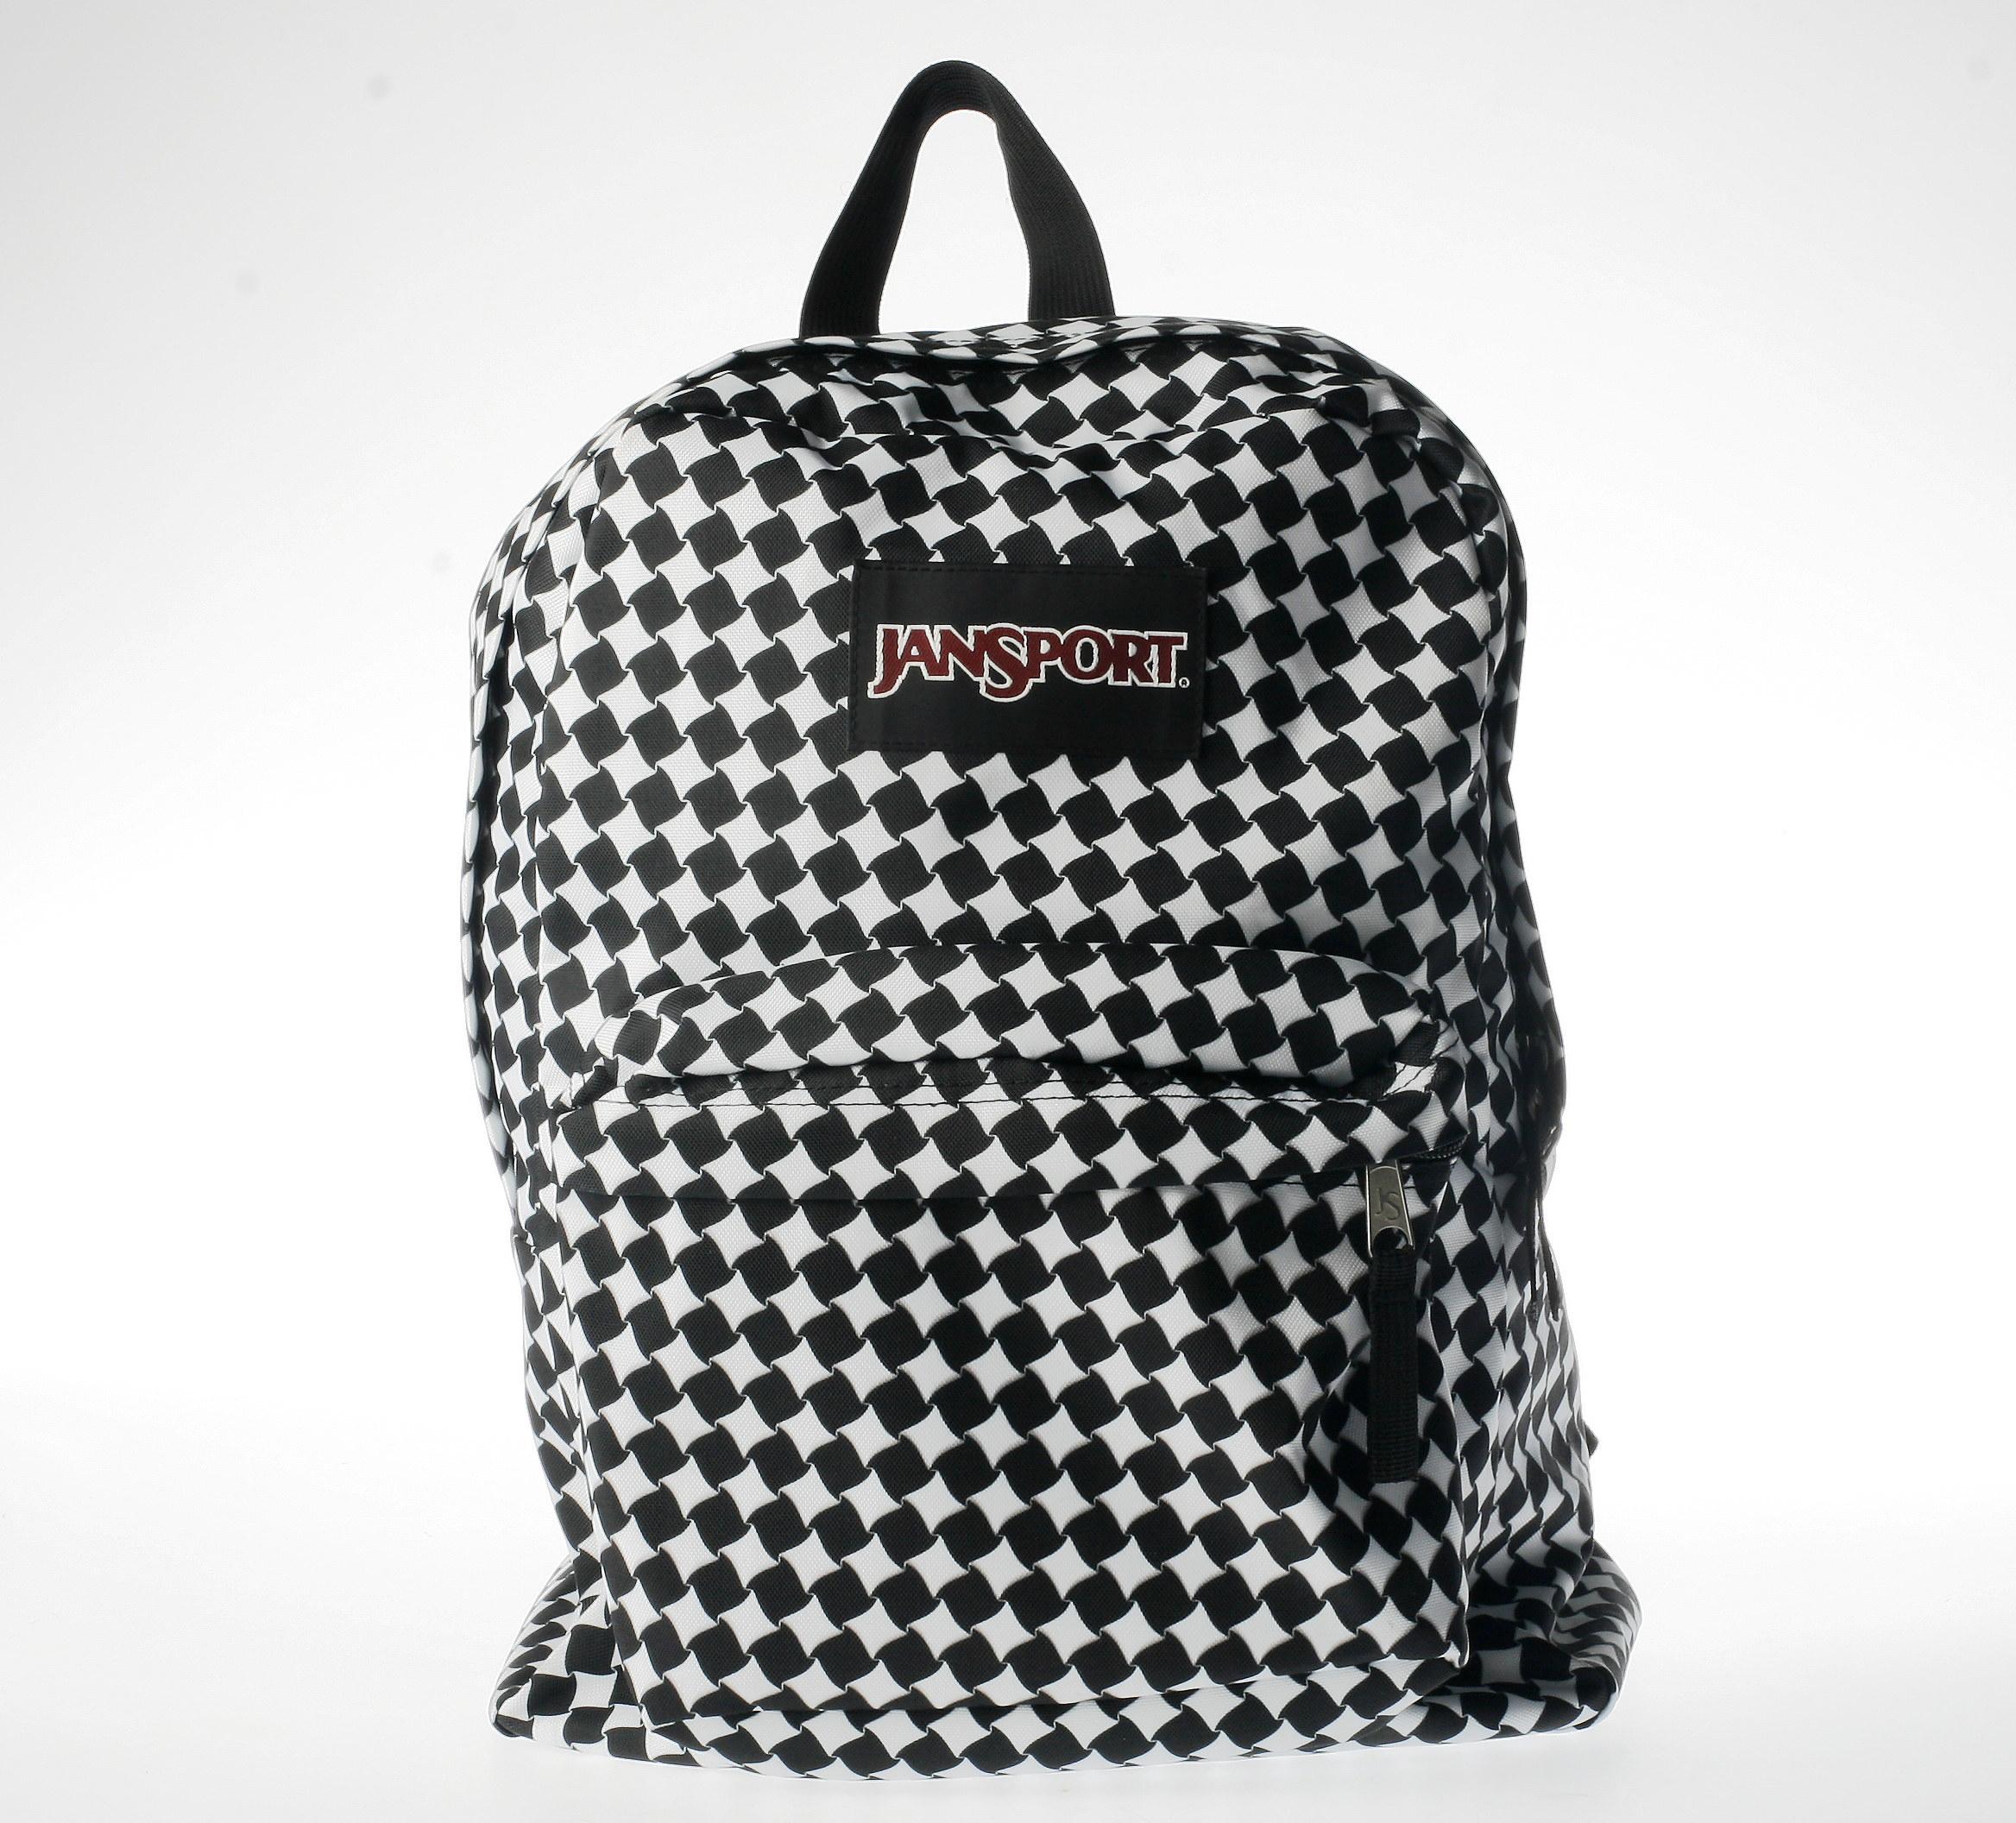 Various back-to-school knapsacks for Weekend